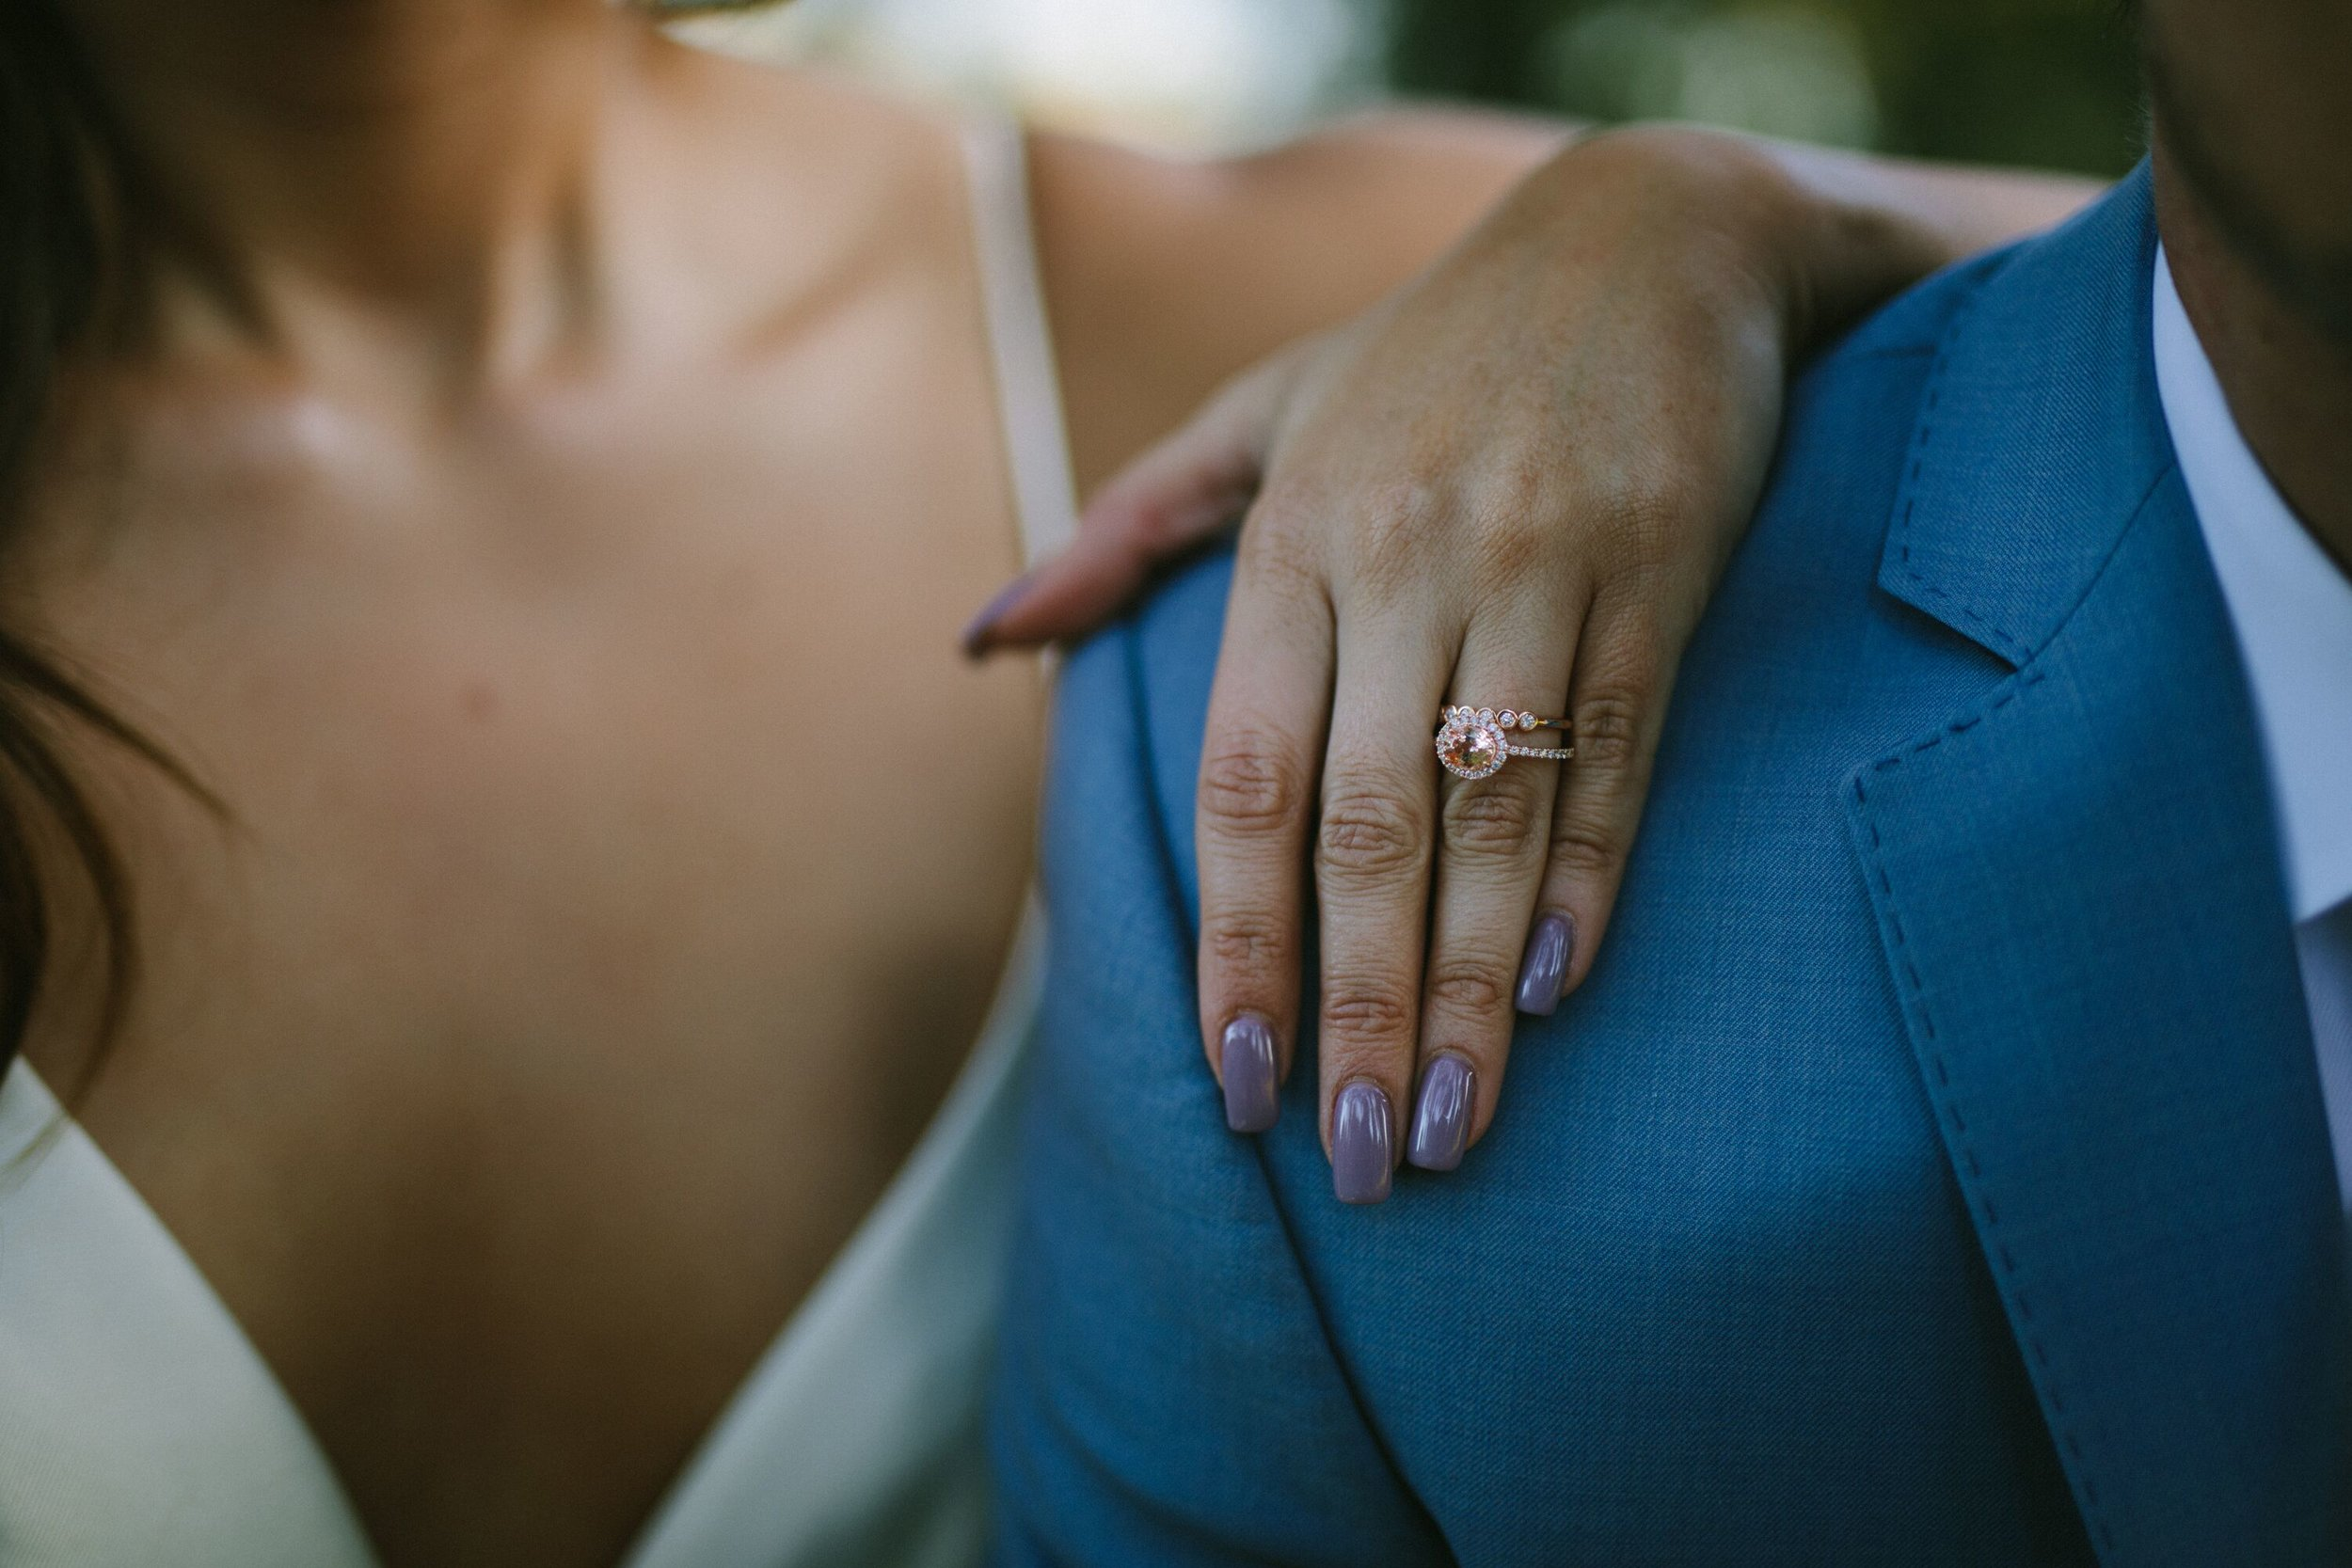 www.santabarbarawedding.com | Photographer: Patrick Ang | Venue: Rancho La Patera & Stow House | Wedding Planner: Elyse Rowen of Elyse Events | Bridal Rings